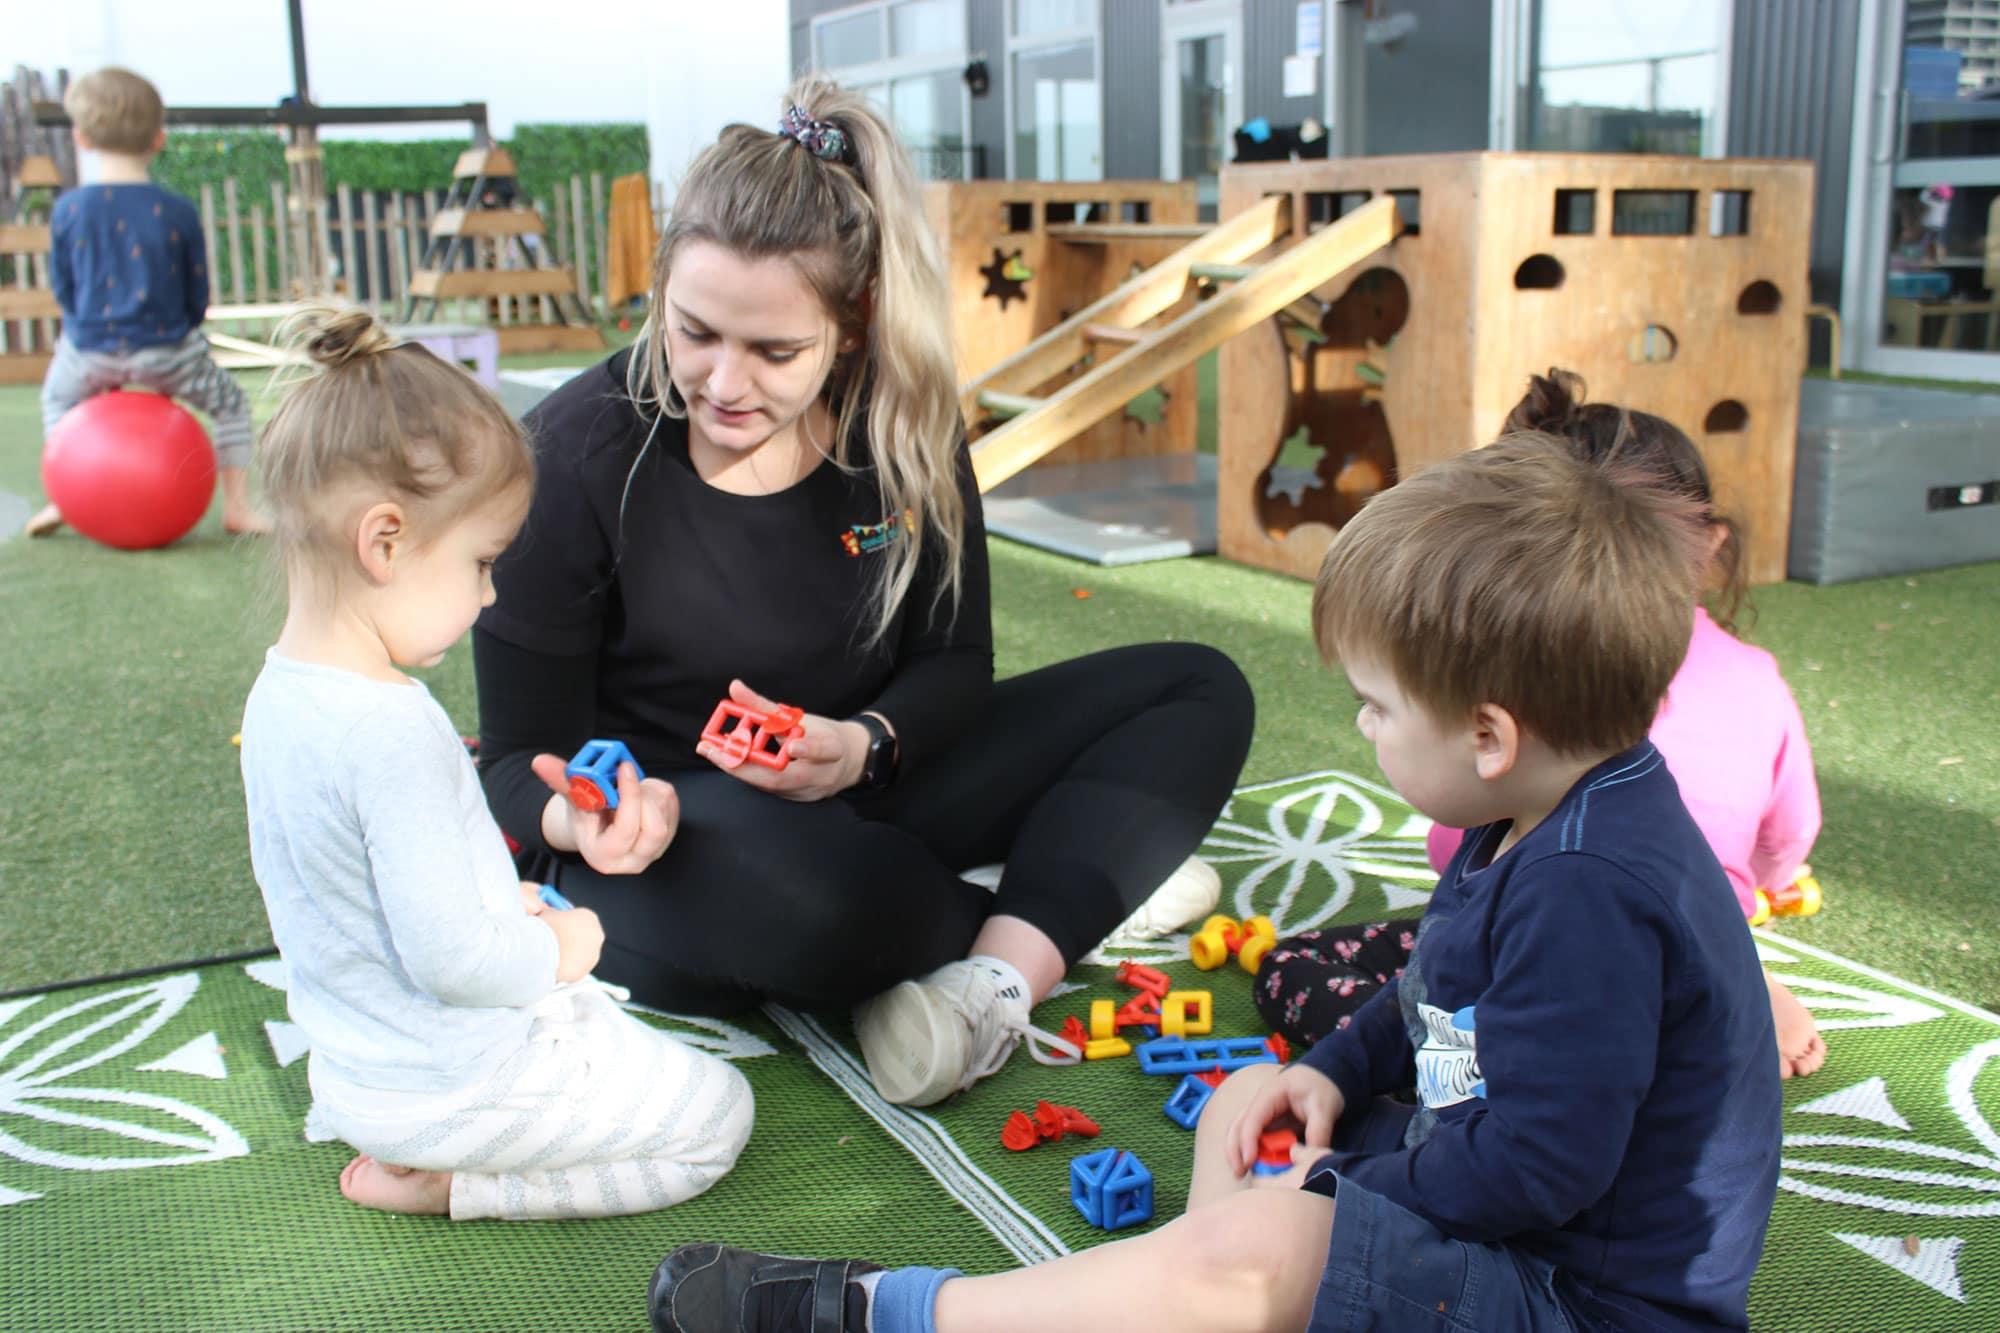 Tayla Kennerley - Early Childhood Teacher in Training